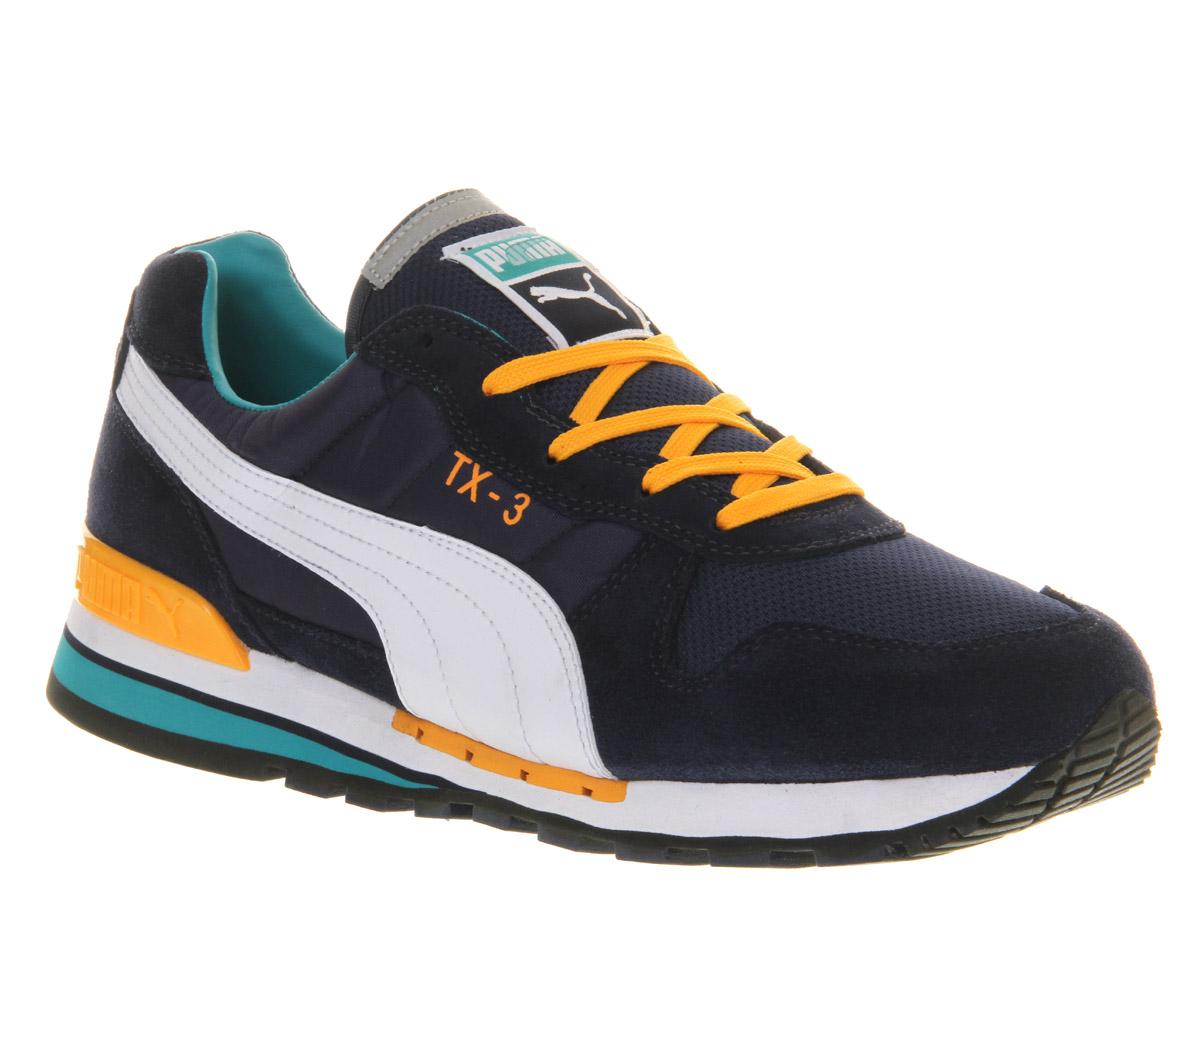 tx-3 sneakers puma